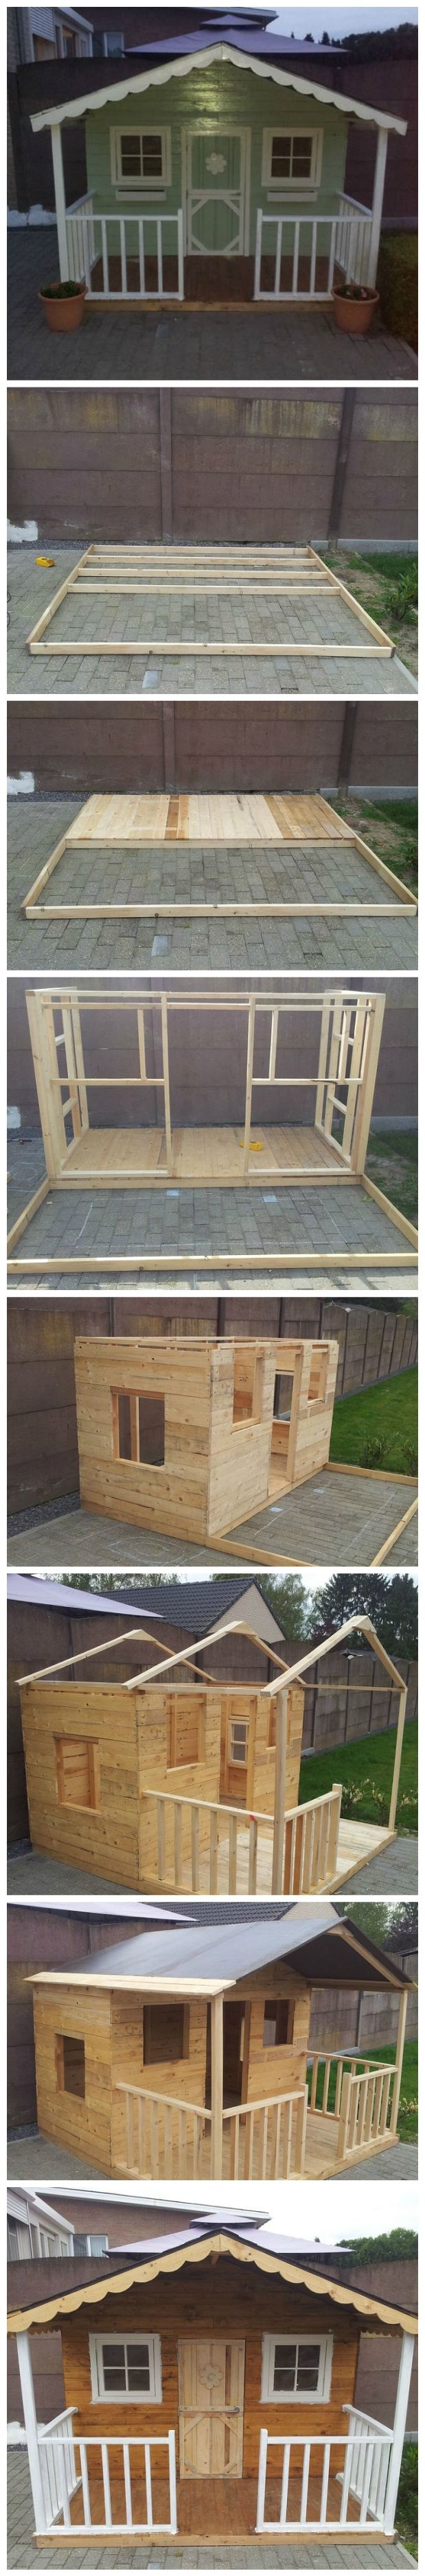 best 25 wood playhouse ideas on pinterest wooden playhouse diy